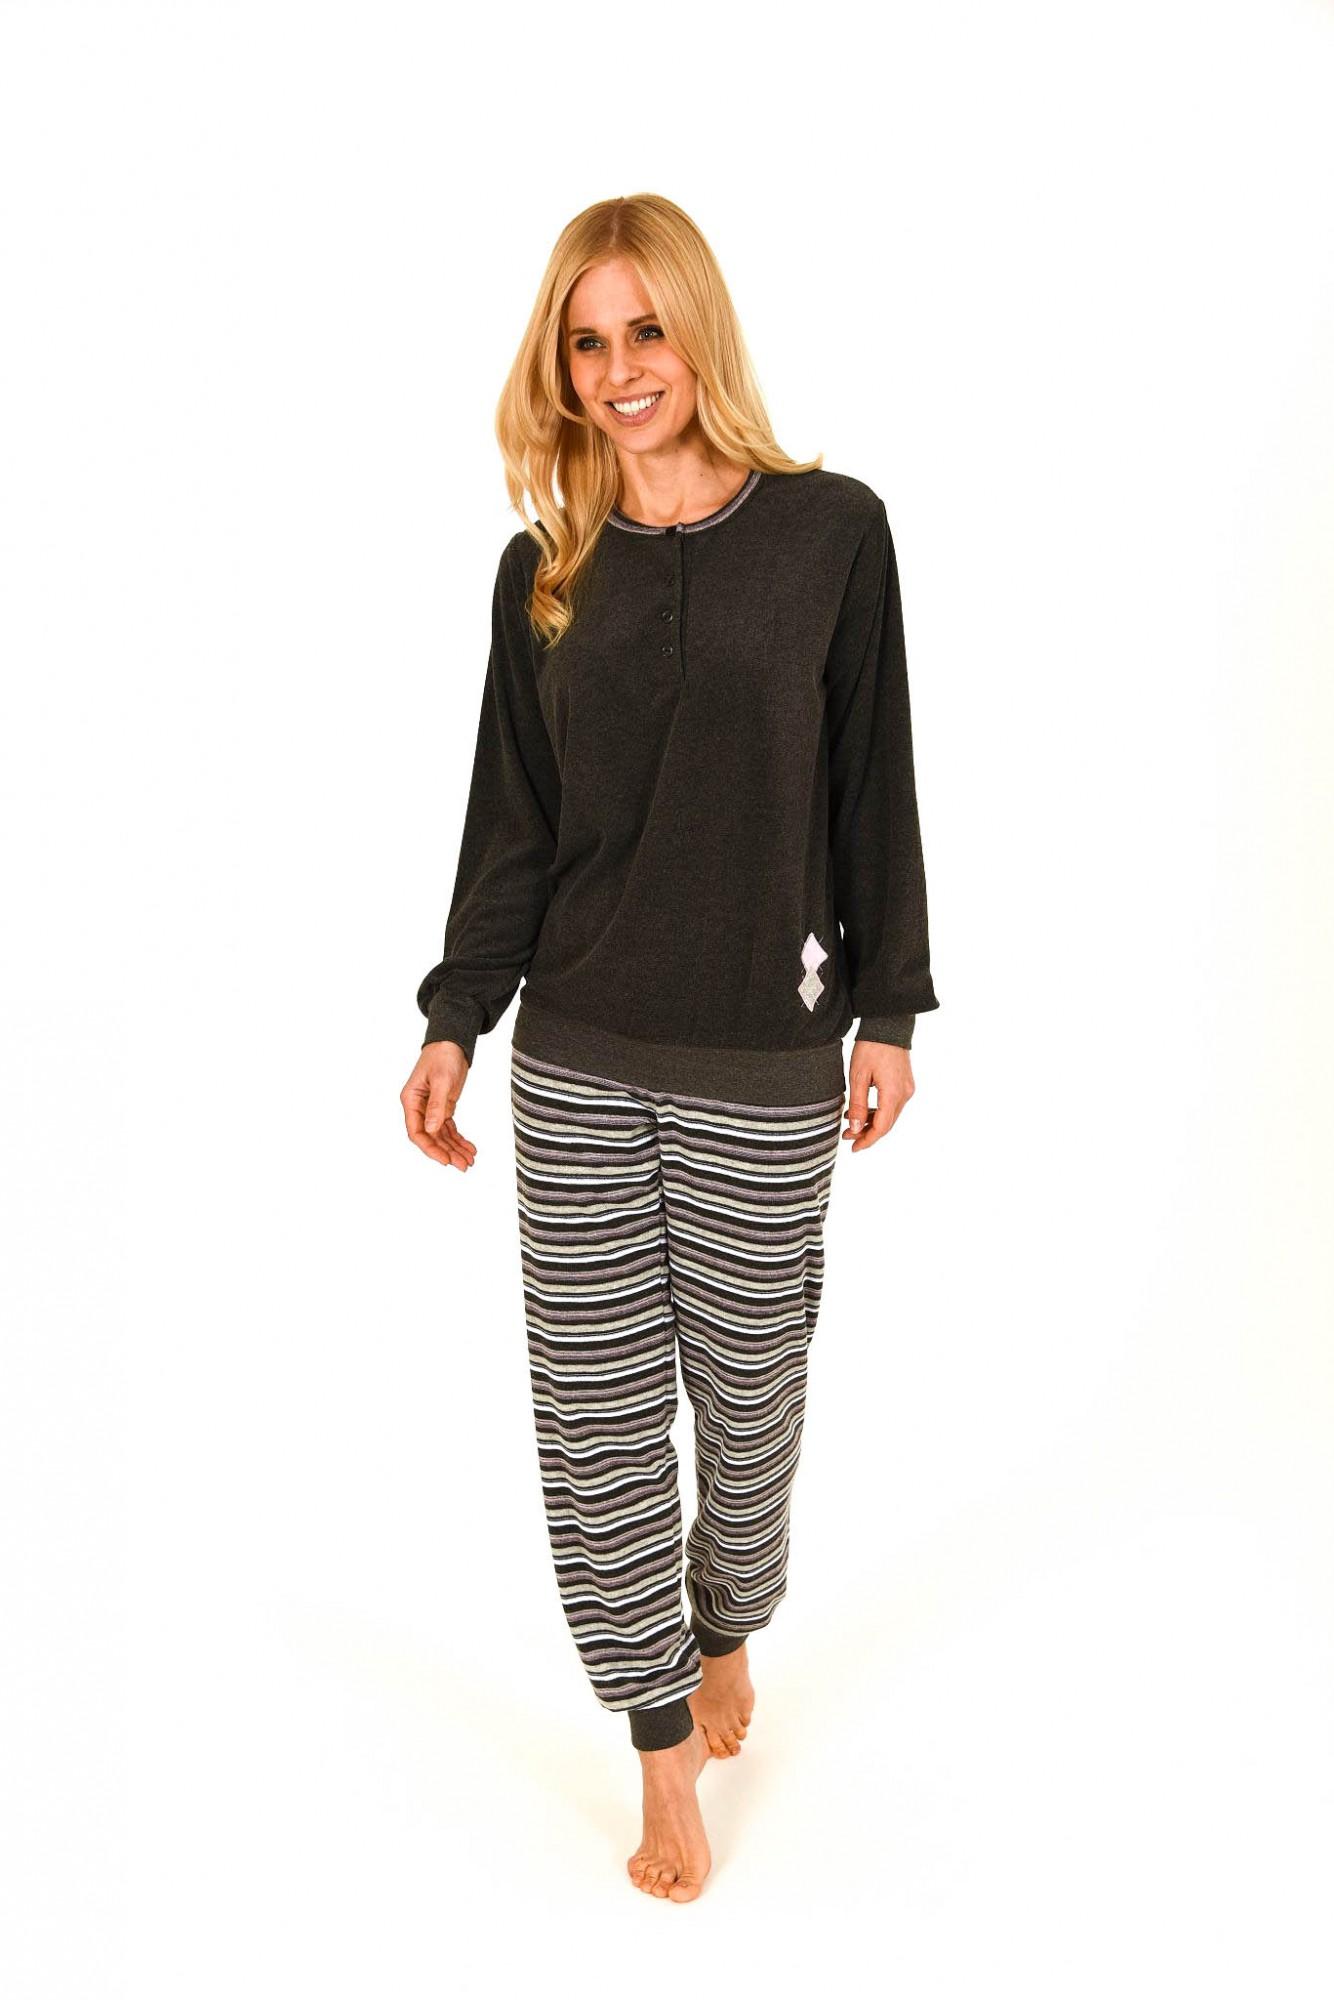 damen frottee pyjama lang mit b ndchen hose gestreift auch in bergr ssen 201 93 236. Black Bedroom Furniture Sets. Home Design Ideas